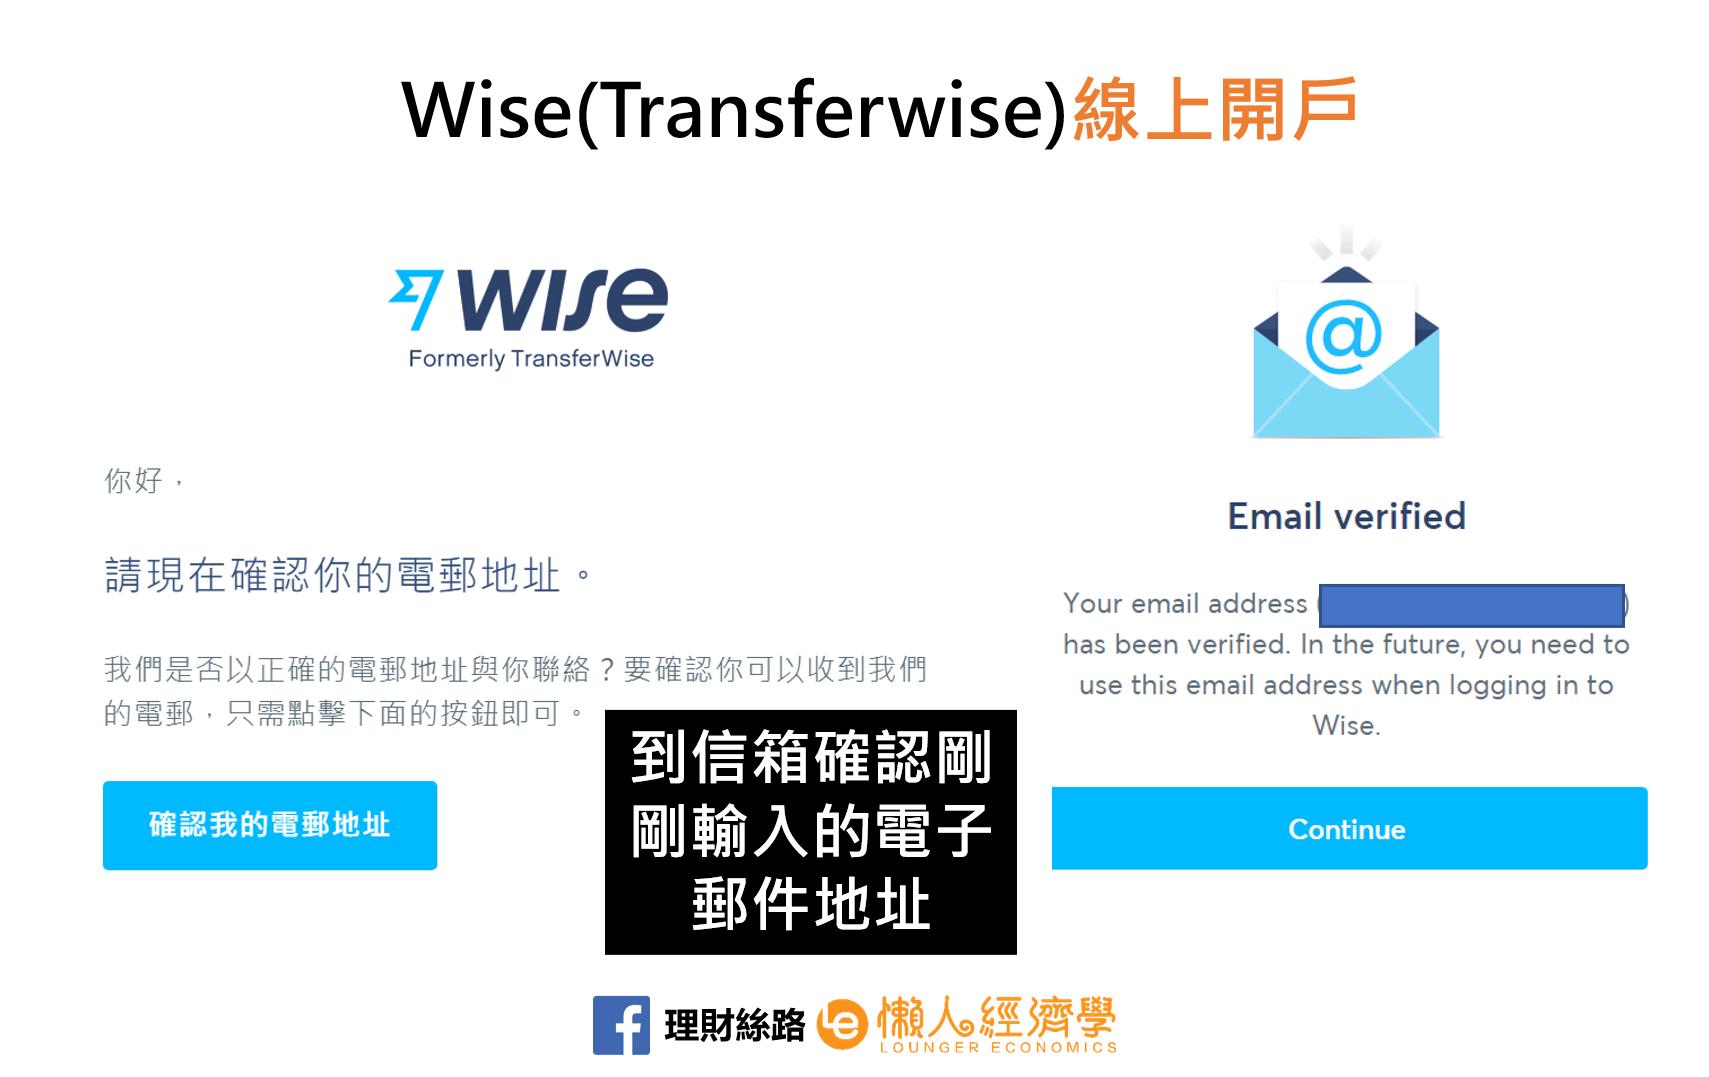 WISE驗證電子郵件